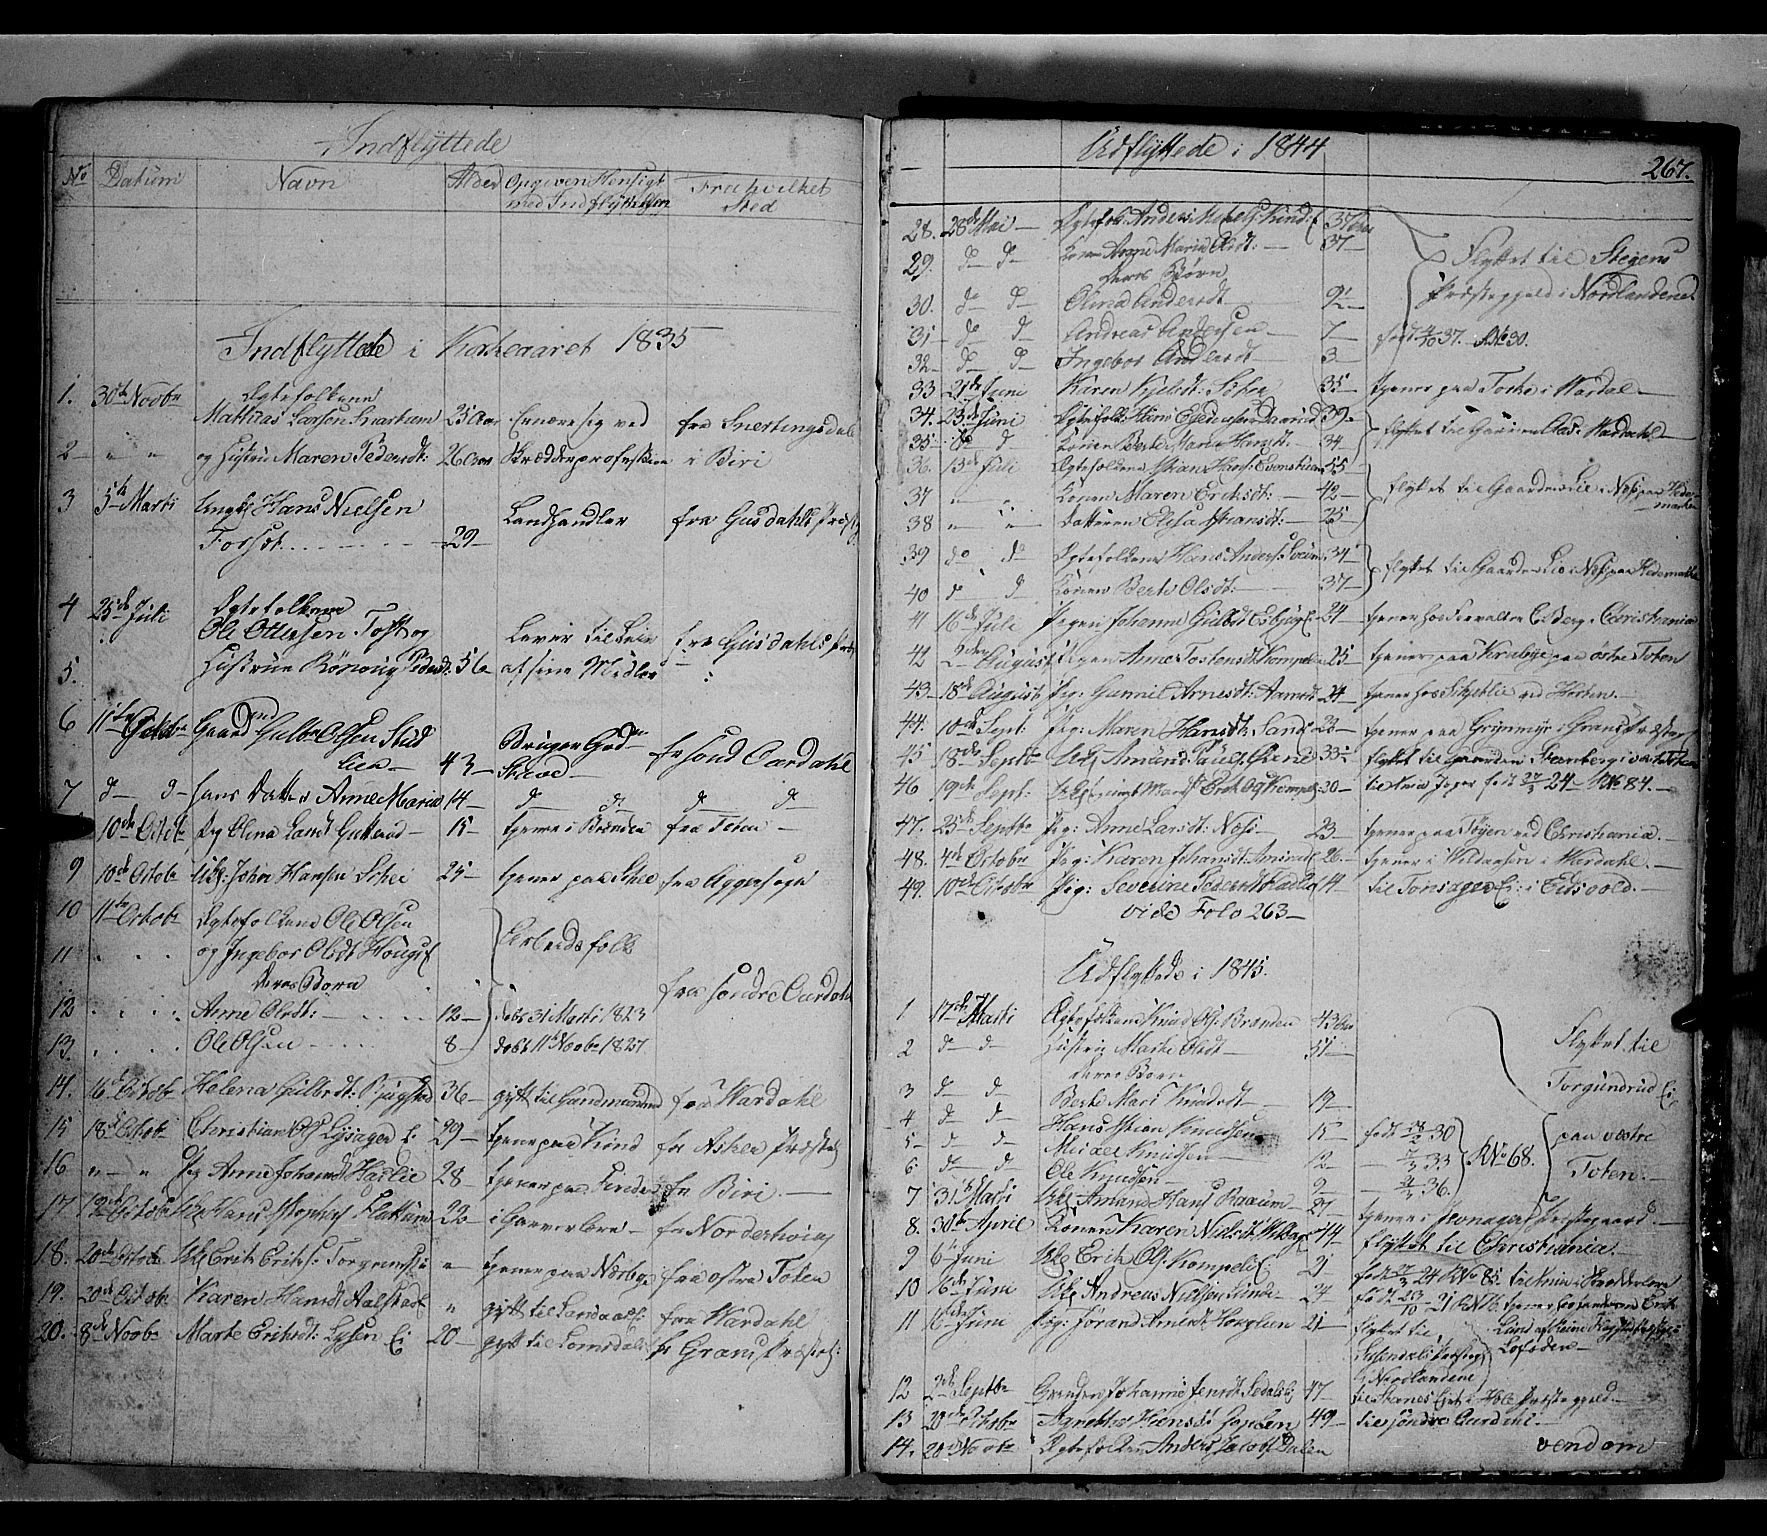 SAH, Land prestekontor, Klokkerbok nr. 2, 1833-1849, s. 267